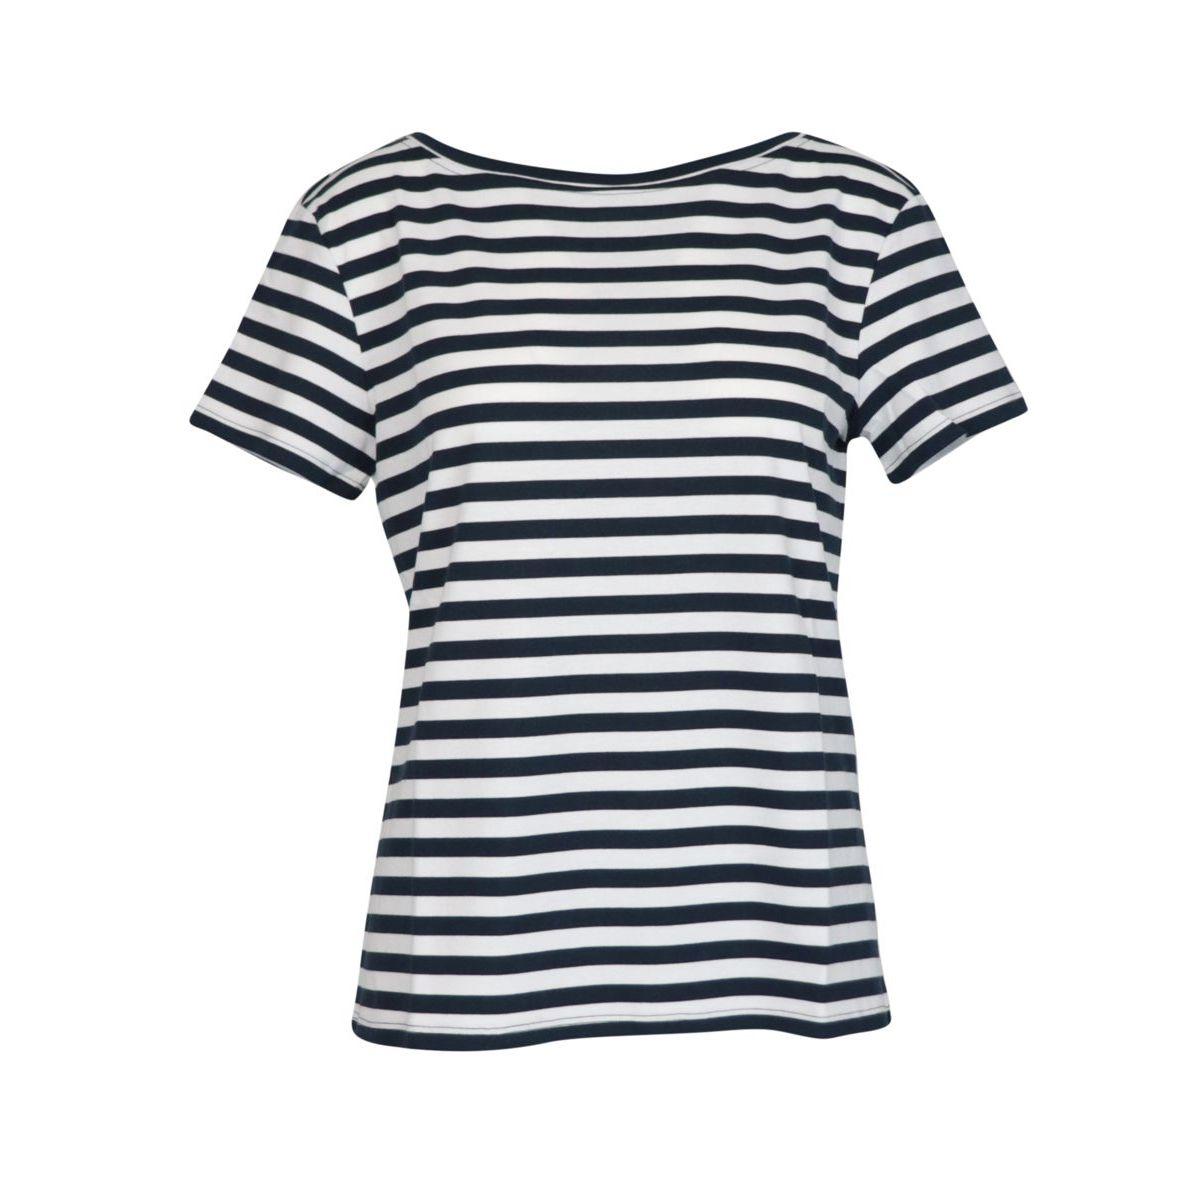 SVELTO short-sleeved T-shirt in cotton jersey White / blue MAX MARA STUDIO